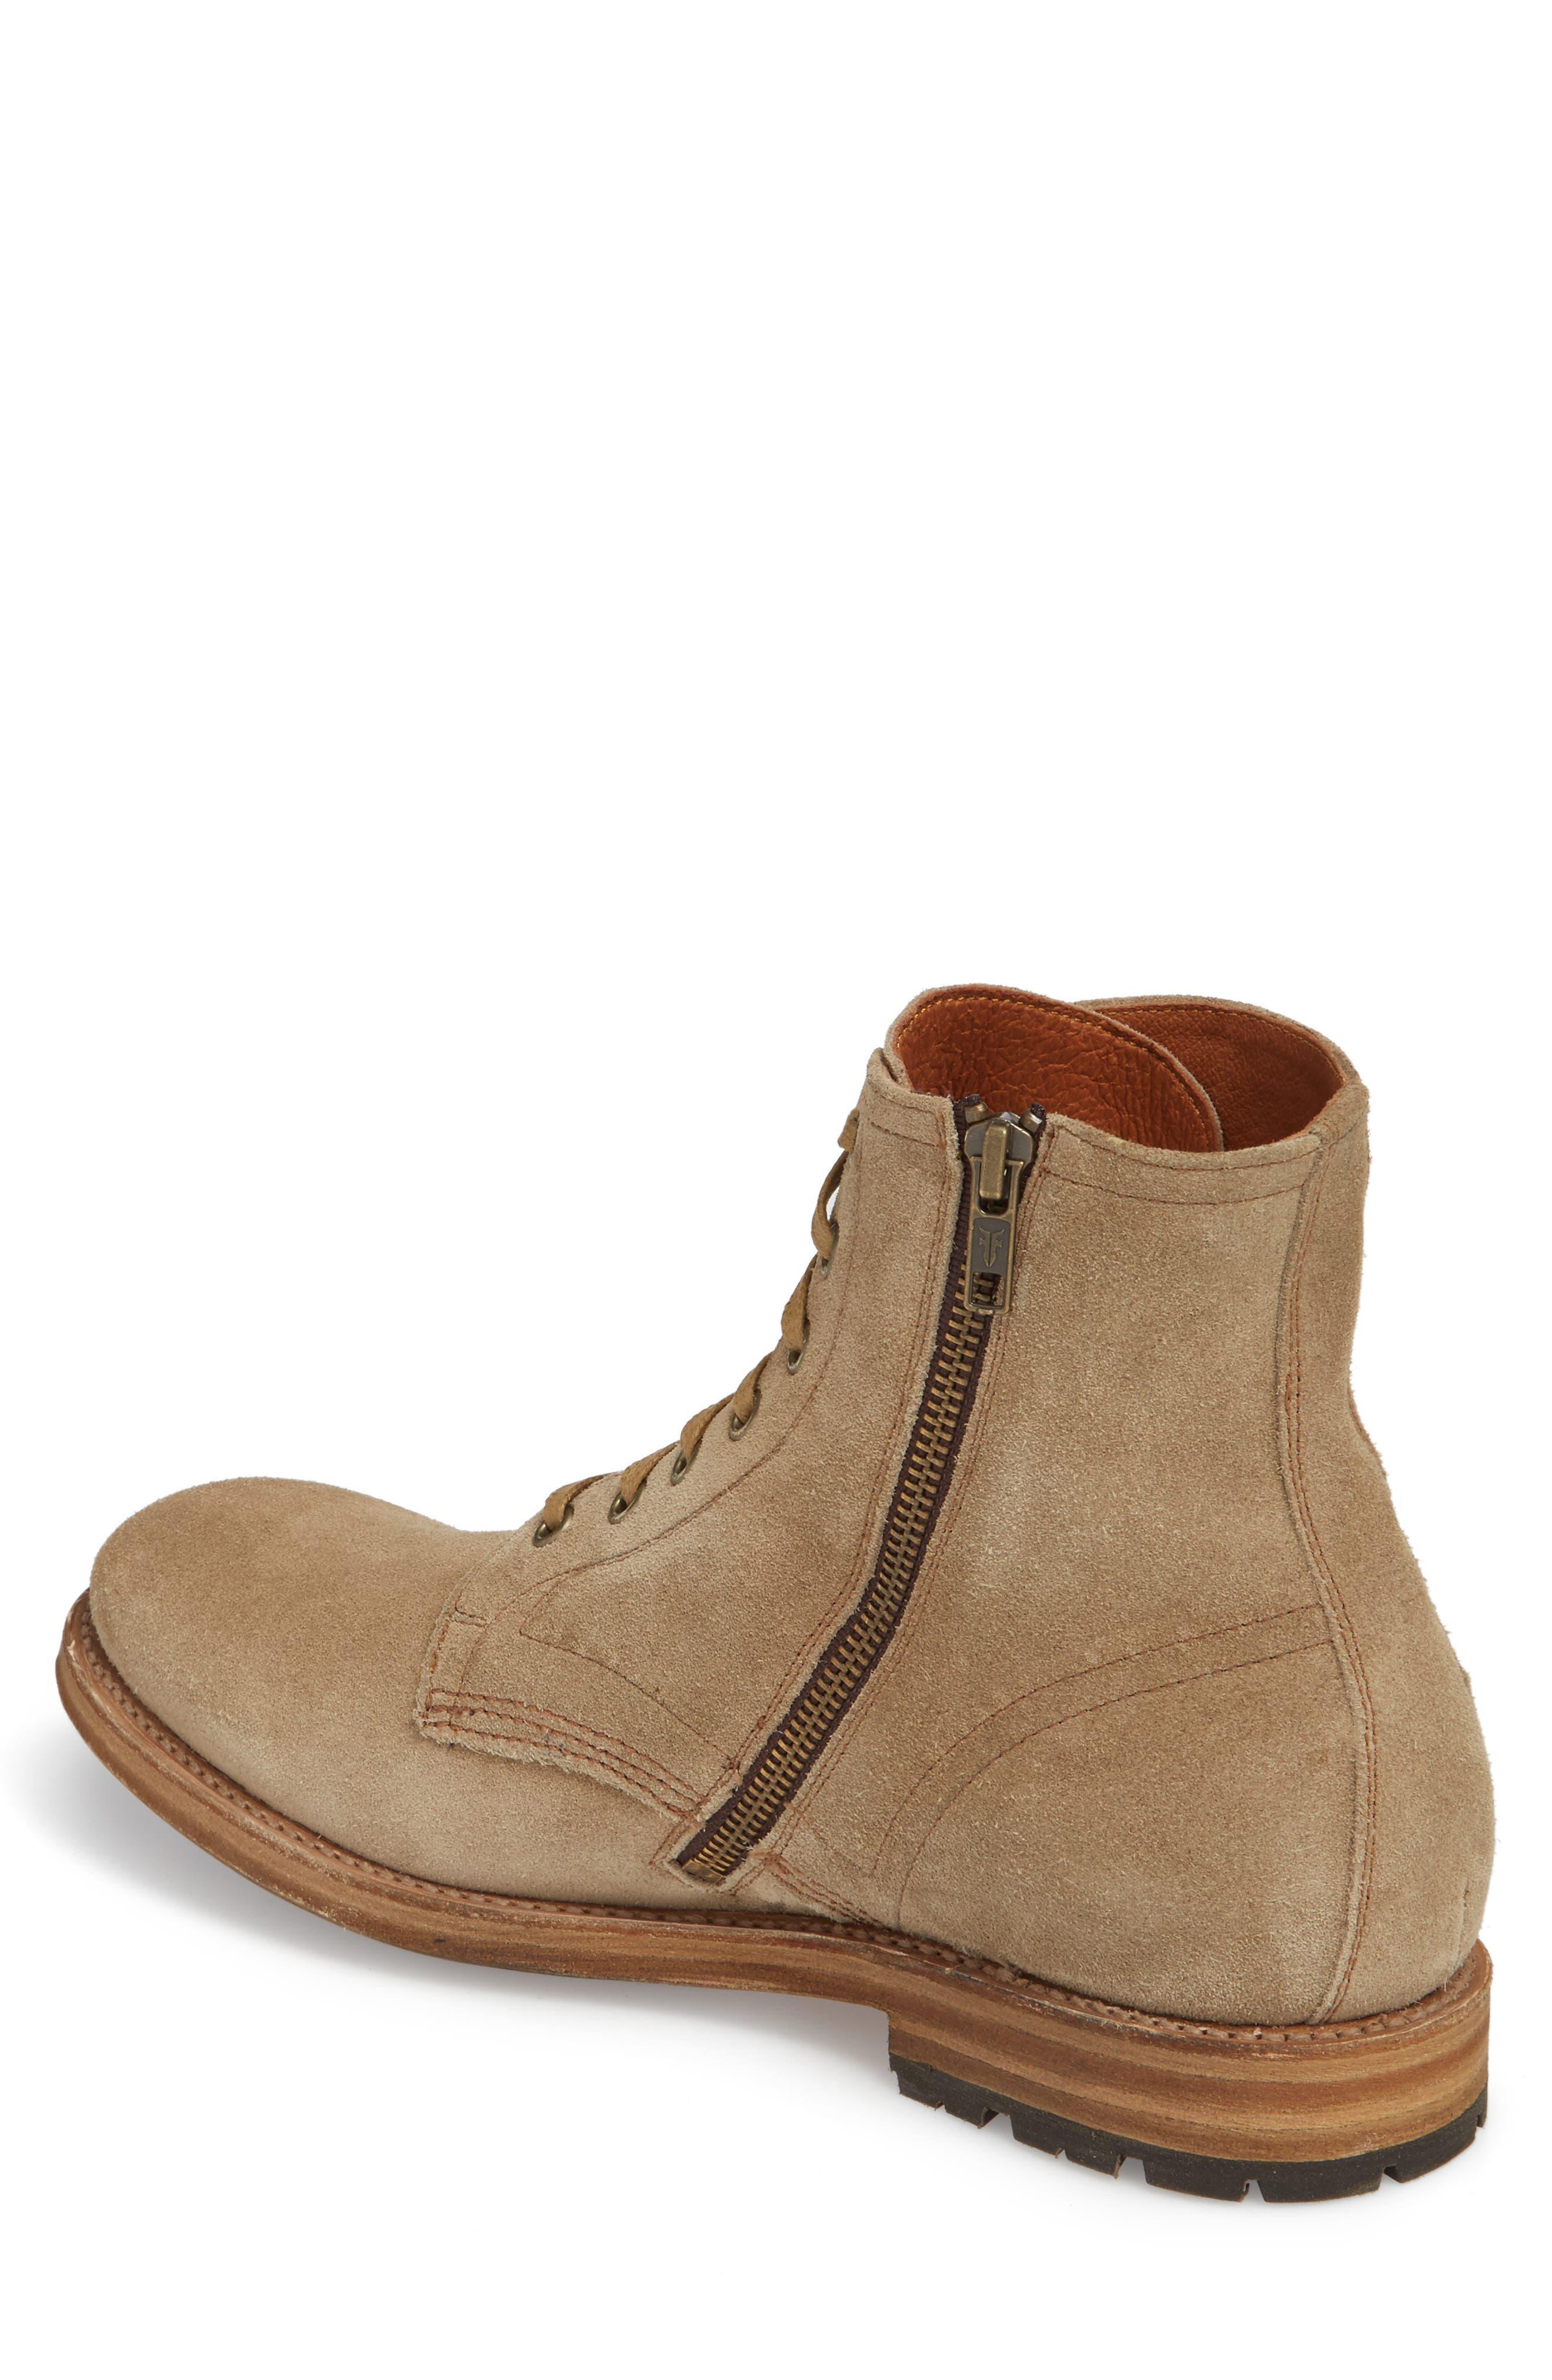 Alternate Image 2  - Fry Bowery Side Zip Combat Boot (Men)